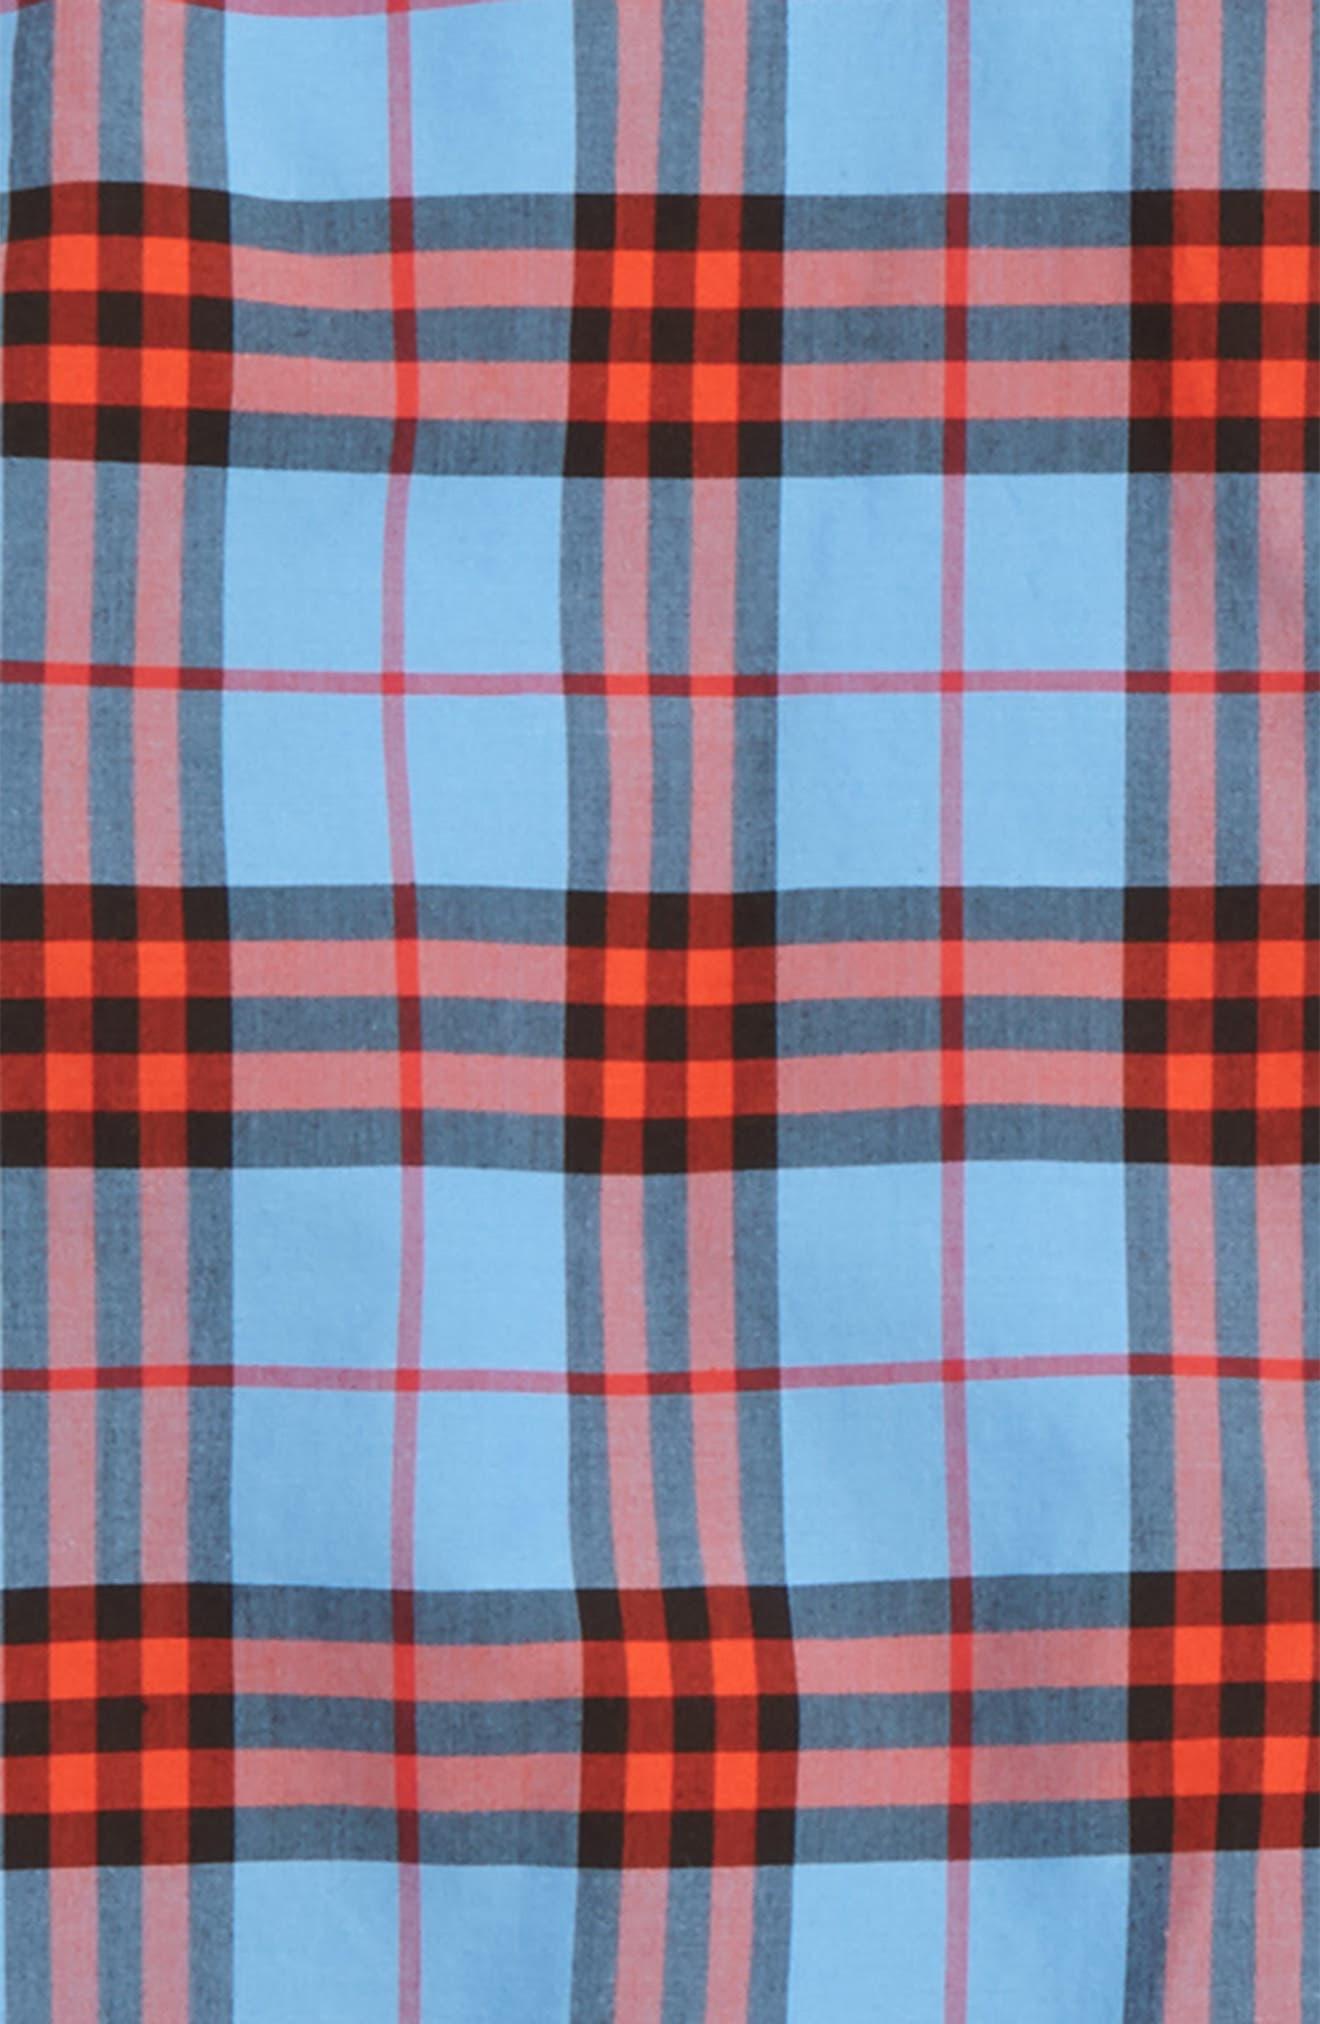 Clarkey Plaid Woven Shirt,                             Alternate thumbnail 2, color,                             428